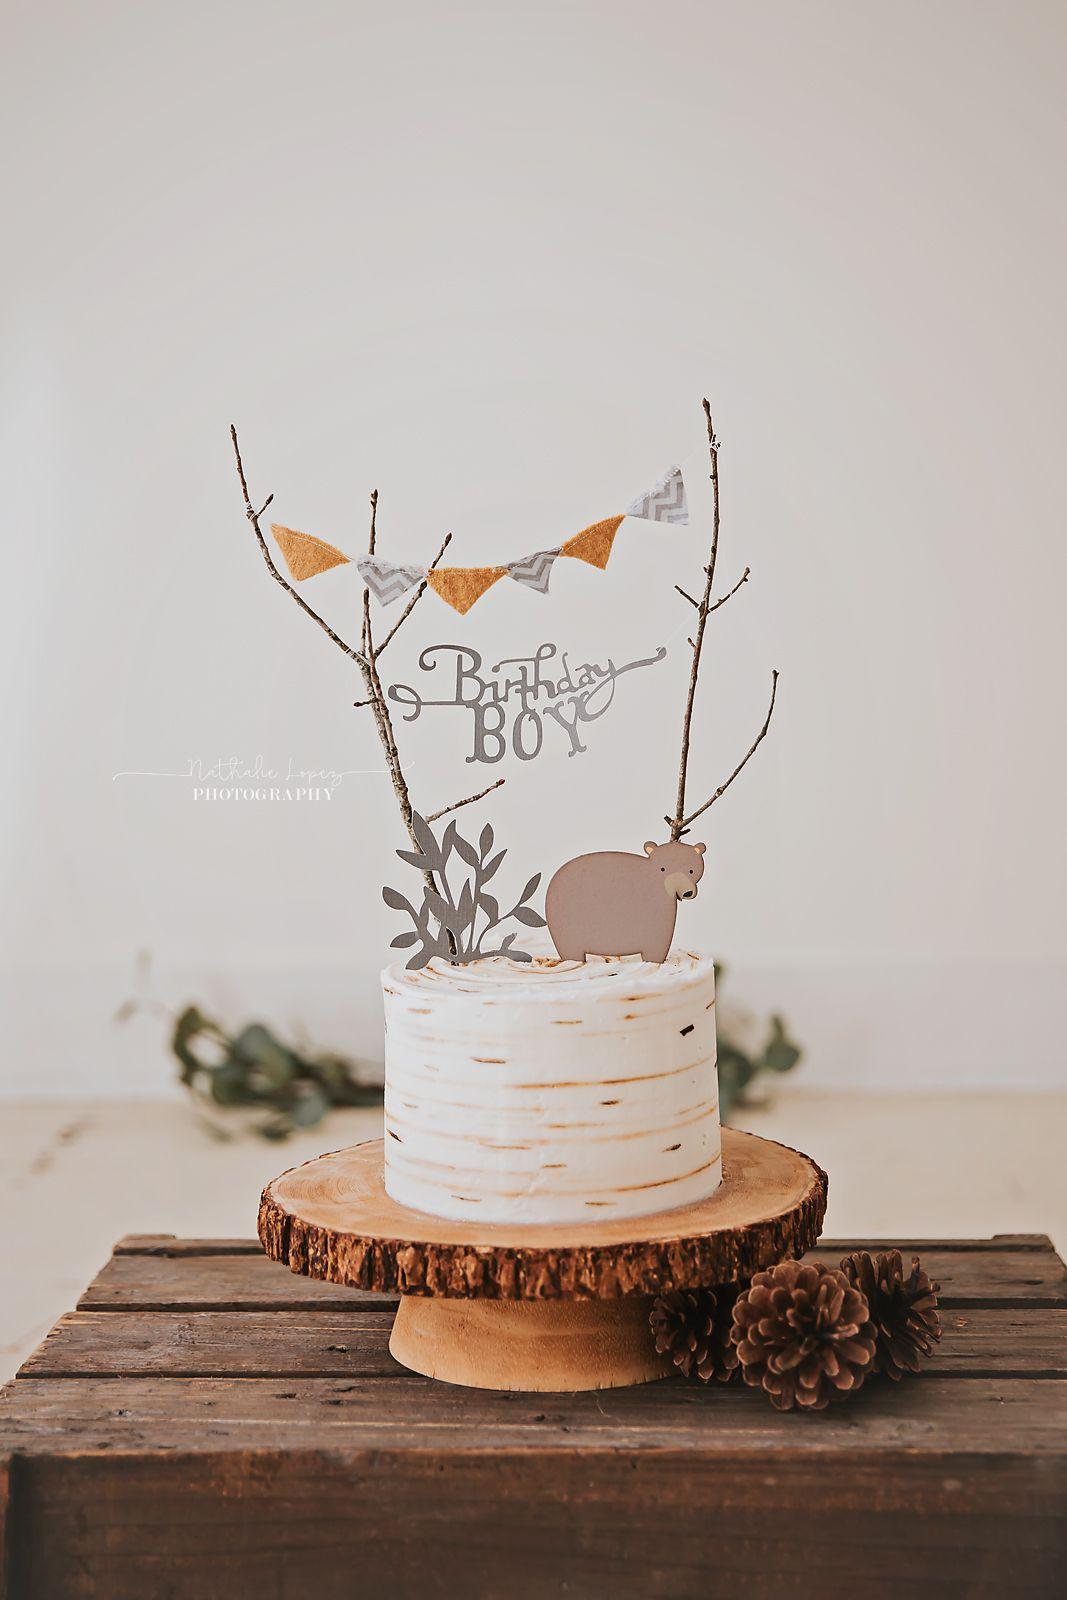 Woodland Cake Smash Theme Birthday Boy Cake Smash Theme Boys First Birthday Cake Baby Boy 1st Birthday Party